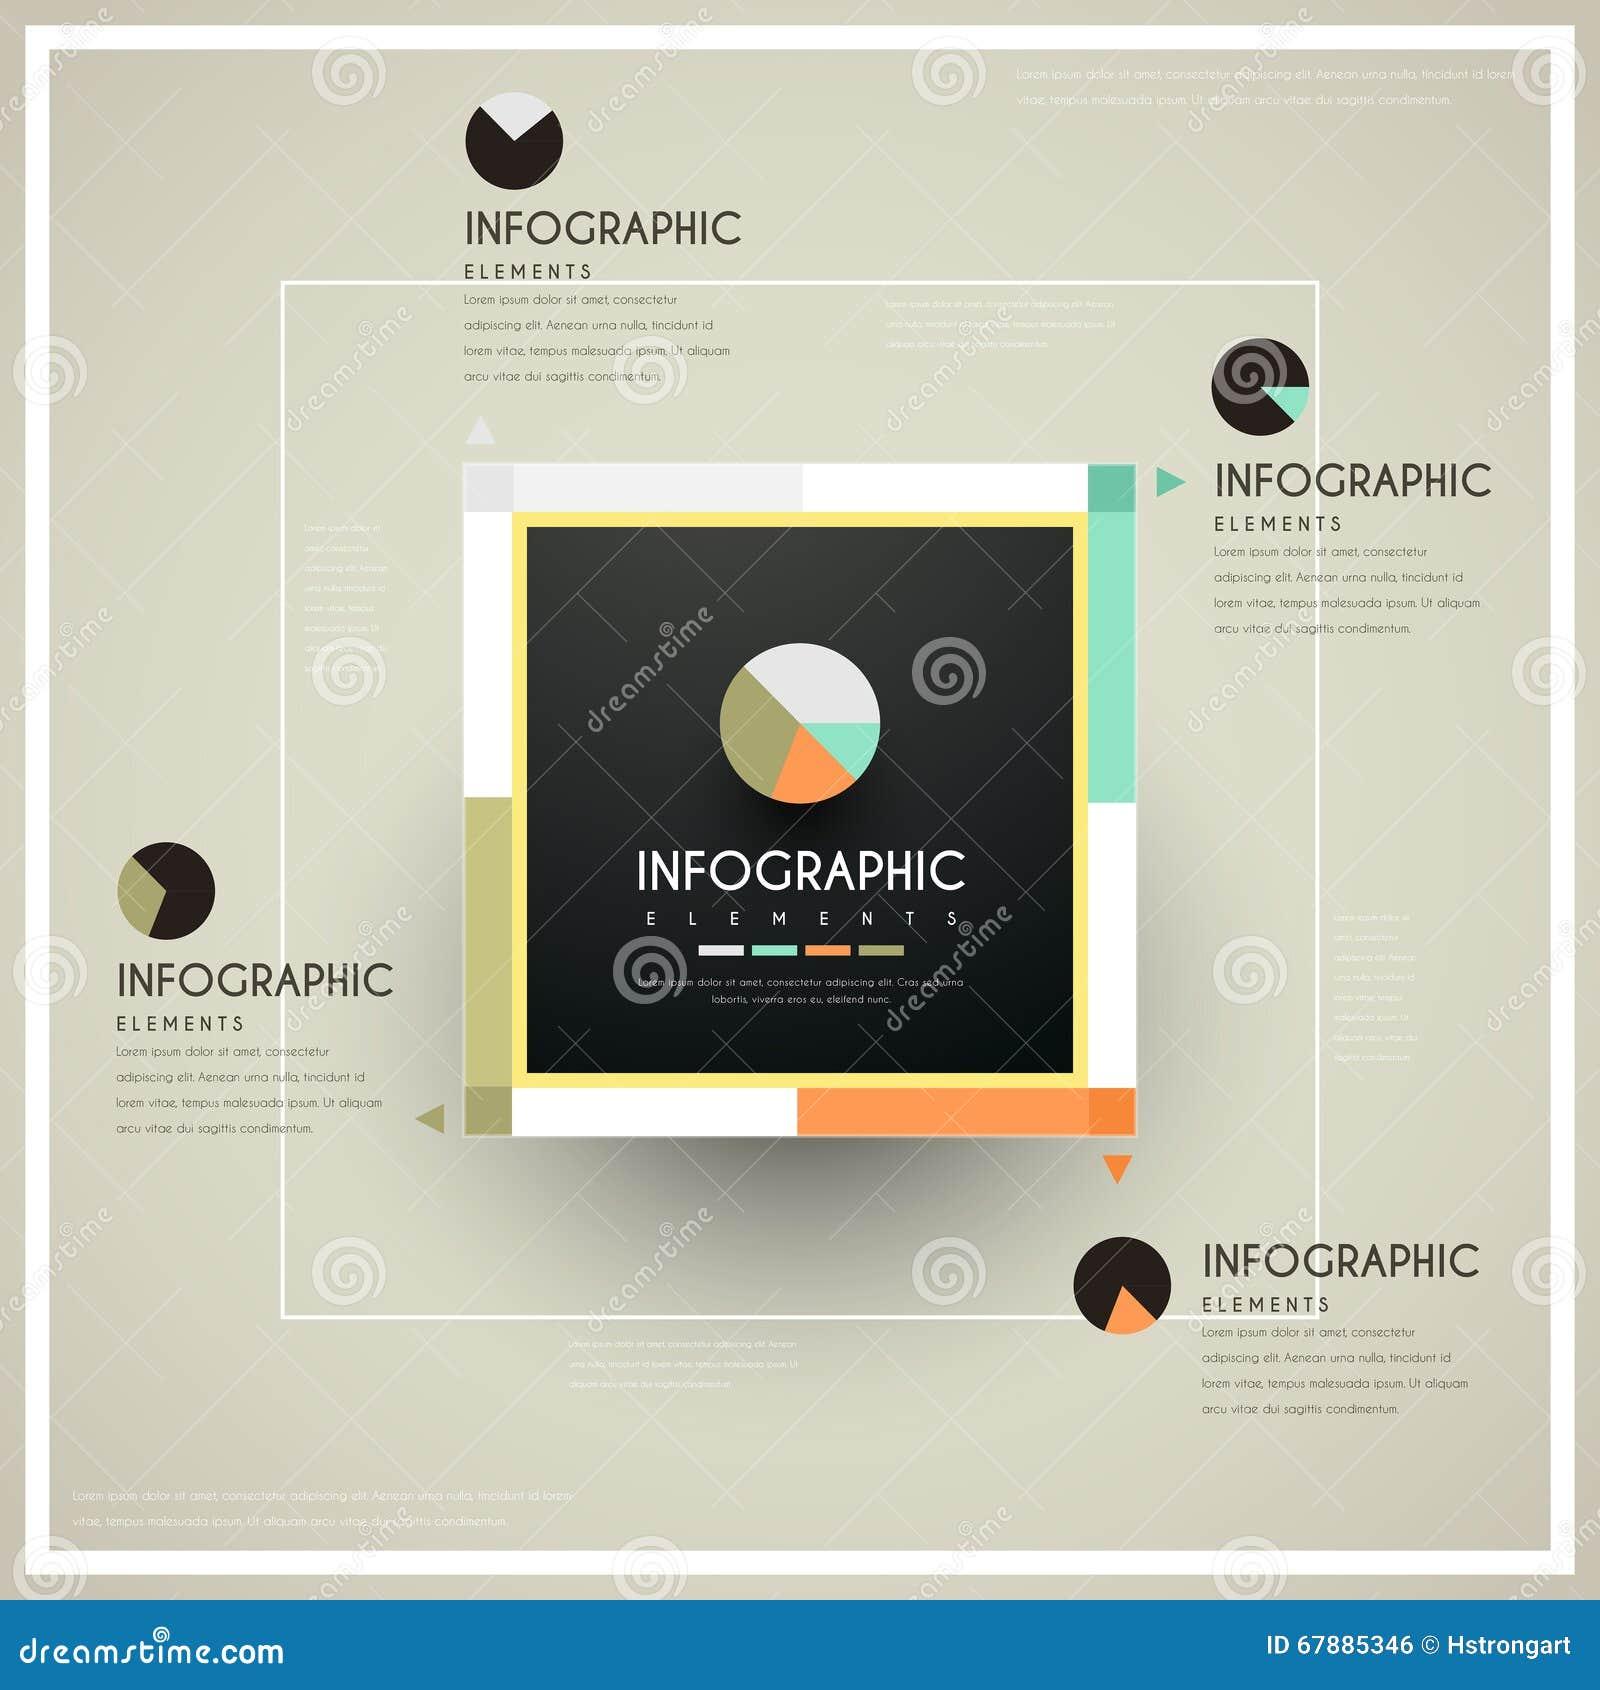 Projeto infographic na moda